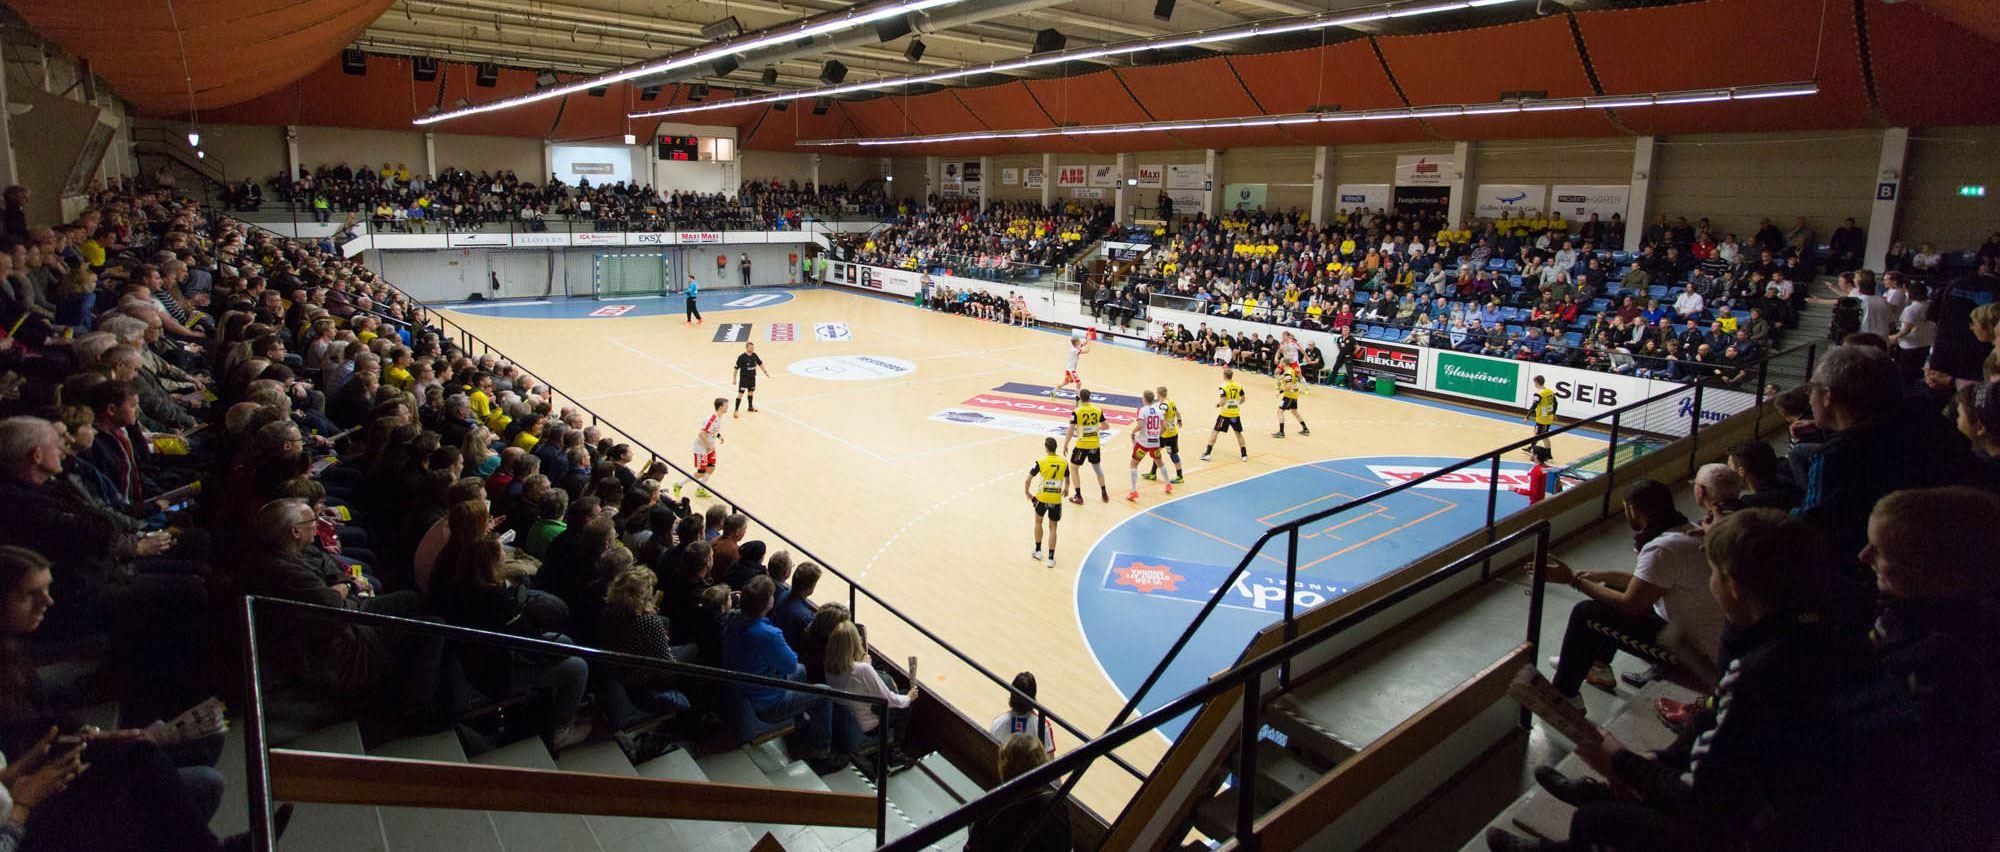 Elitseriematch i handboll - HiF Karlskrona - Richo HK